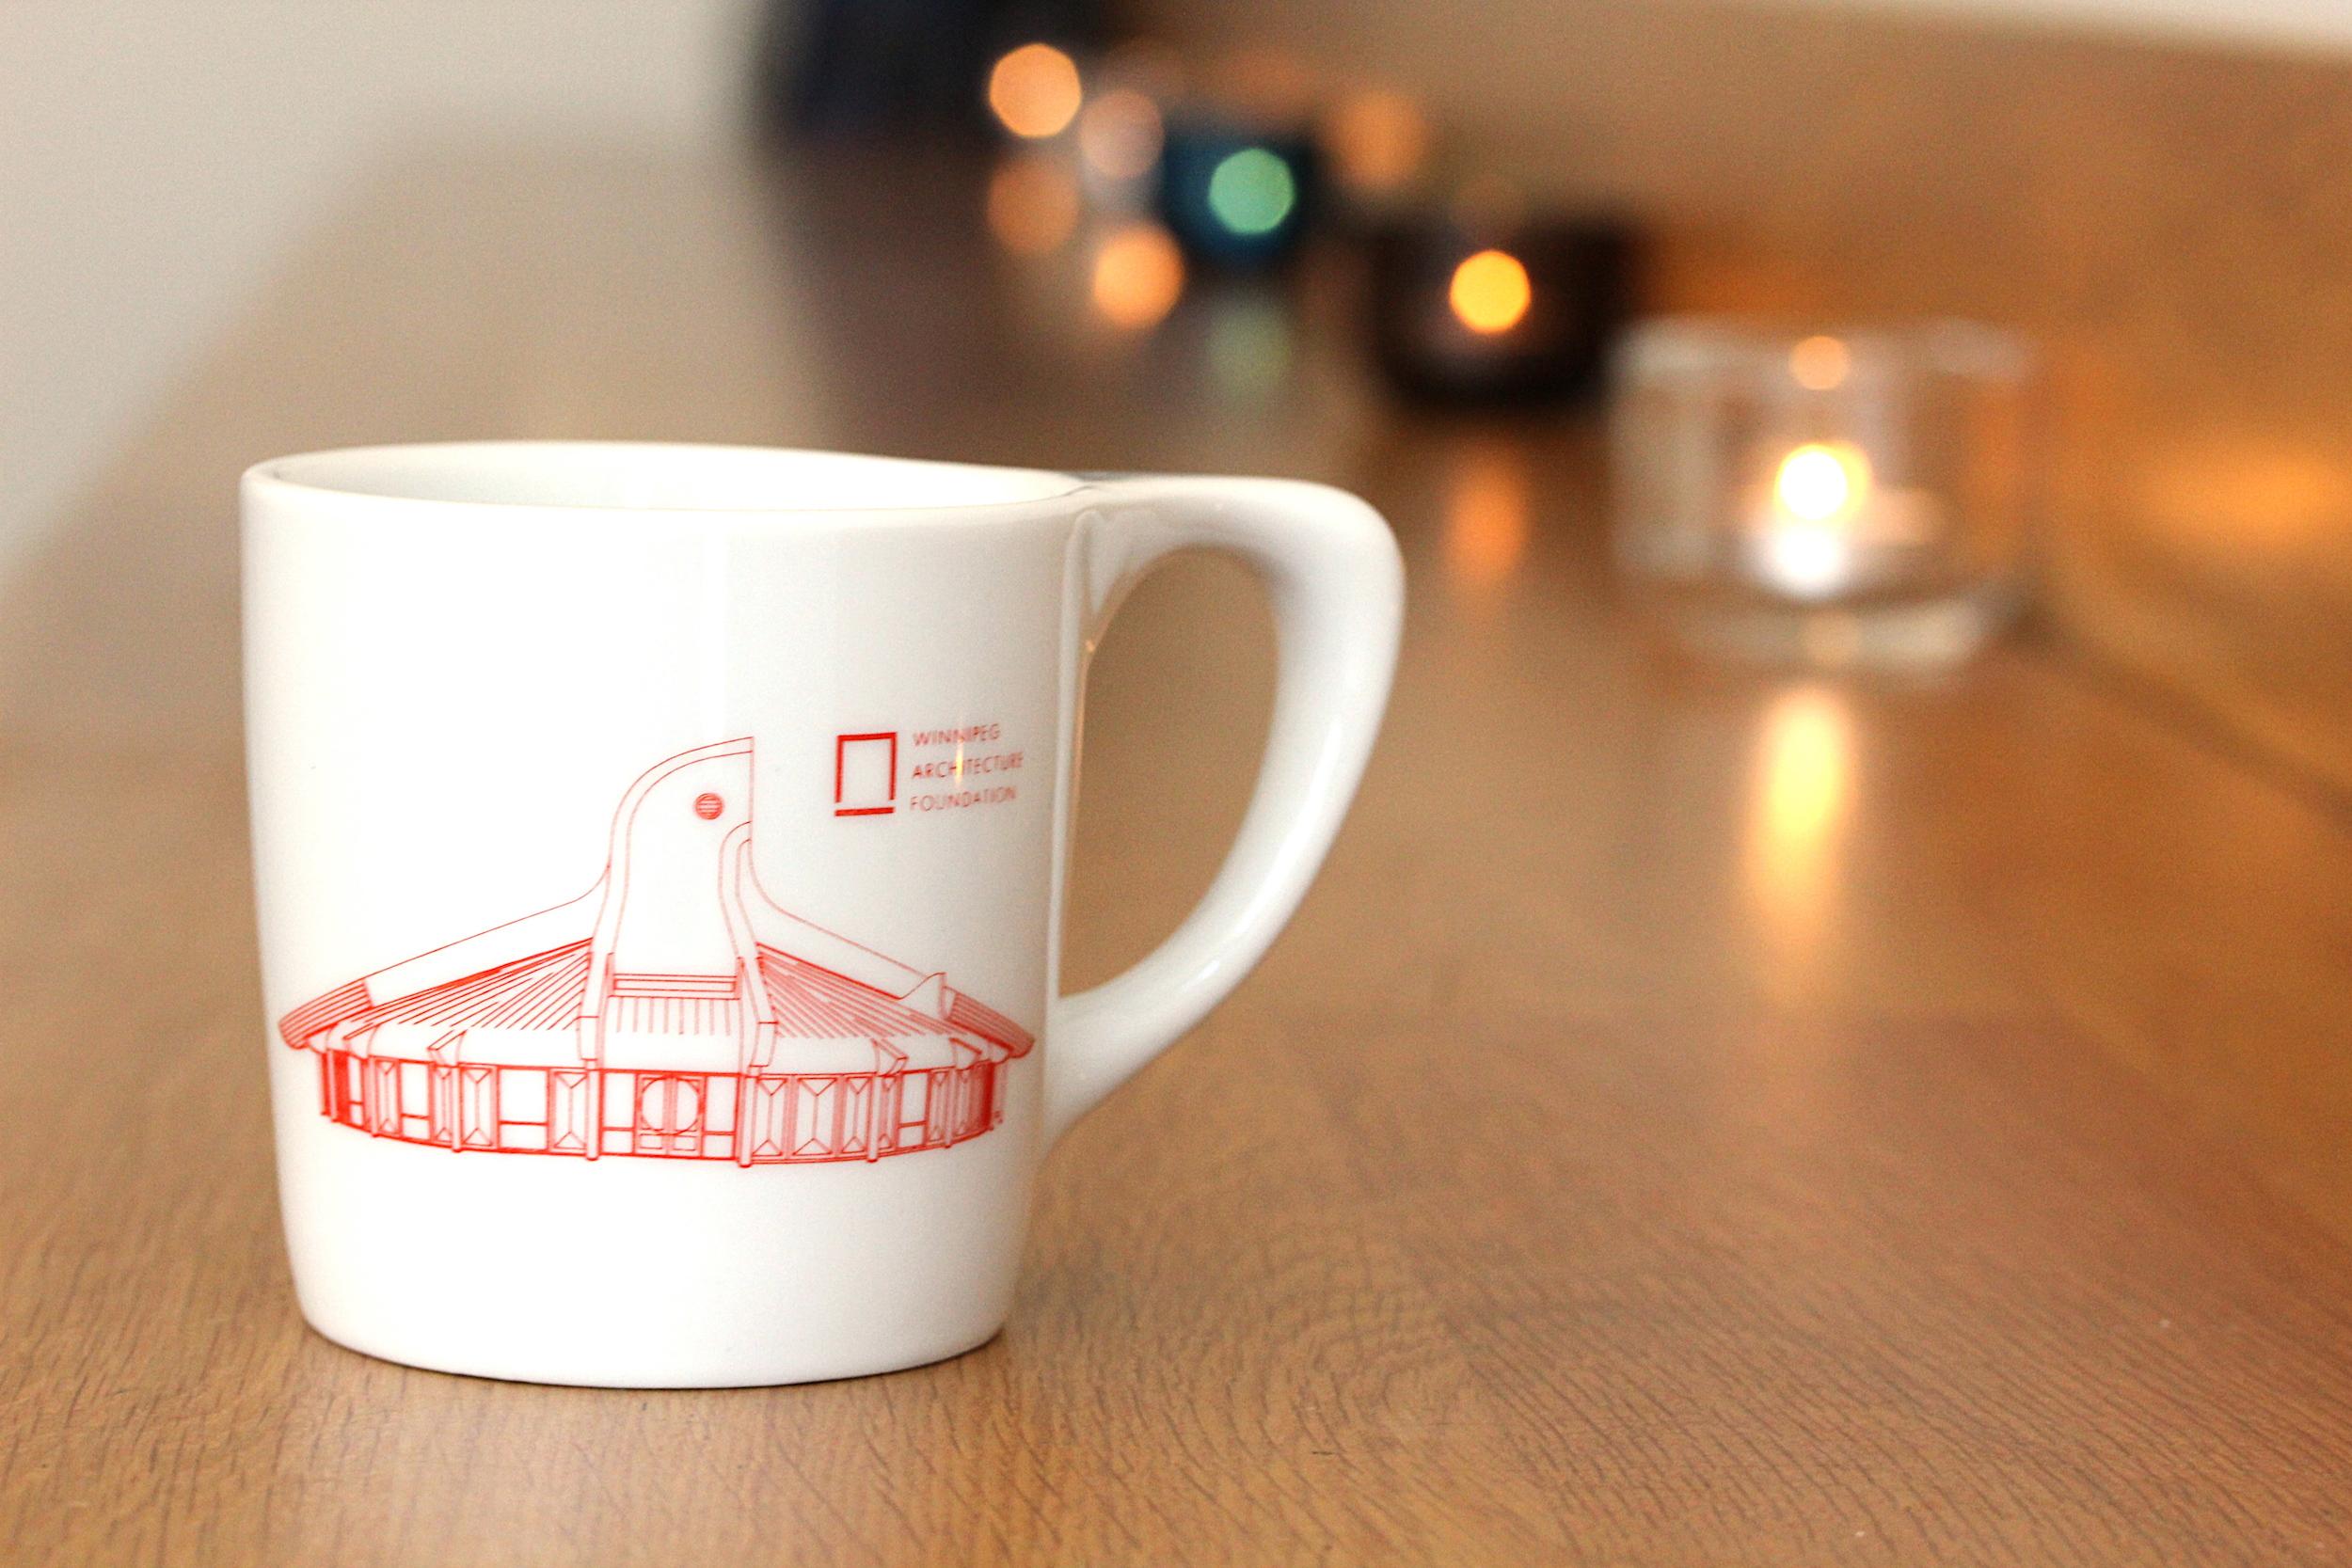 Thunderbird House mug